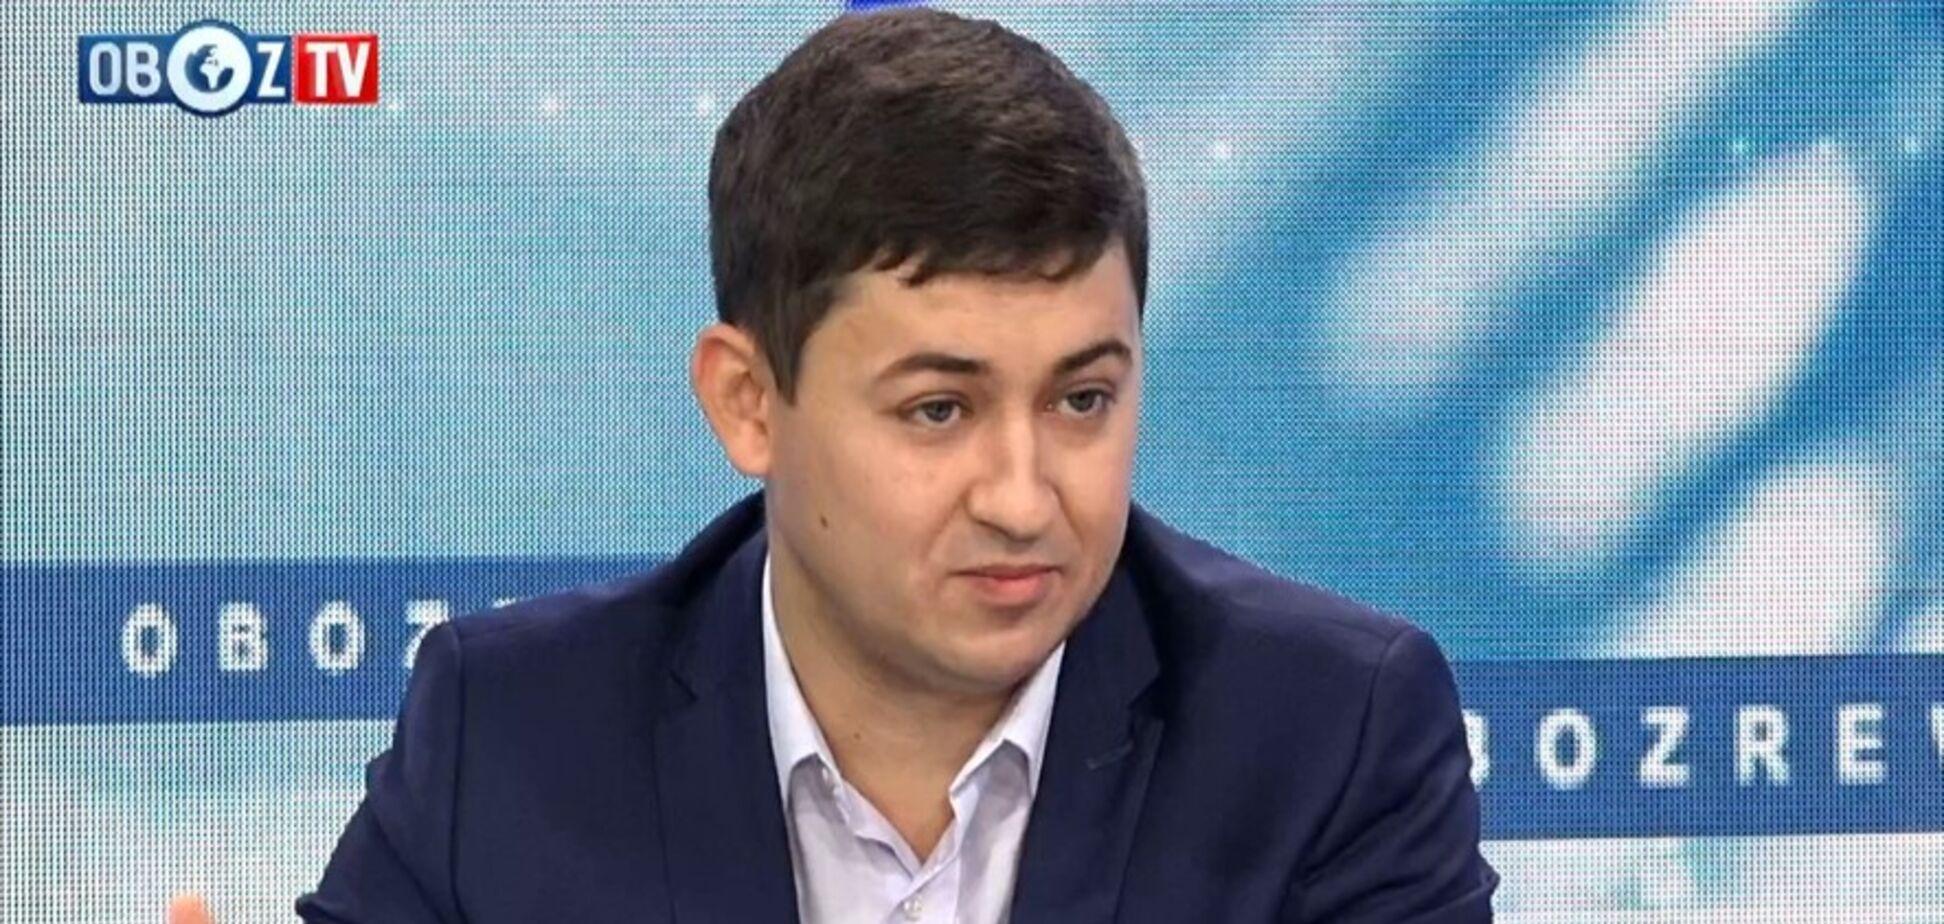 Призначення американського адвоката радником Зеленського: як це вплине на Україну